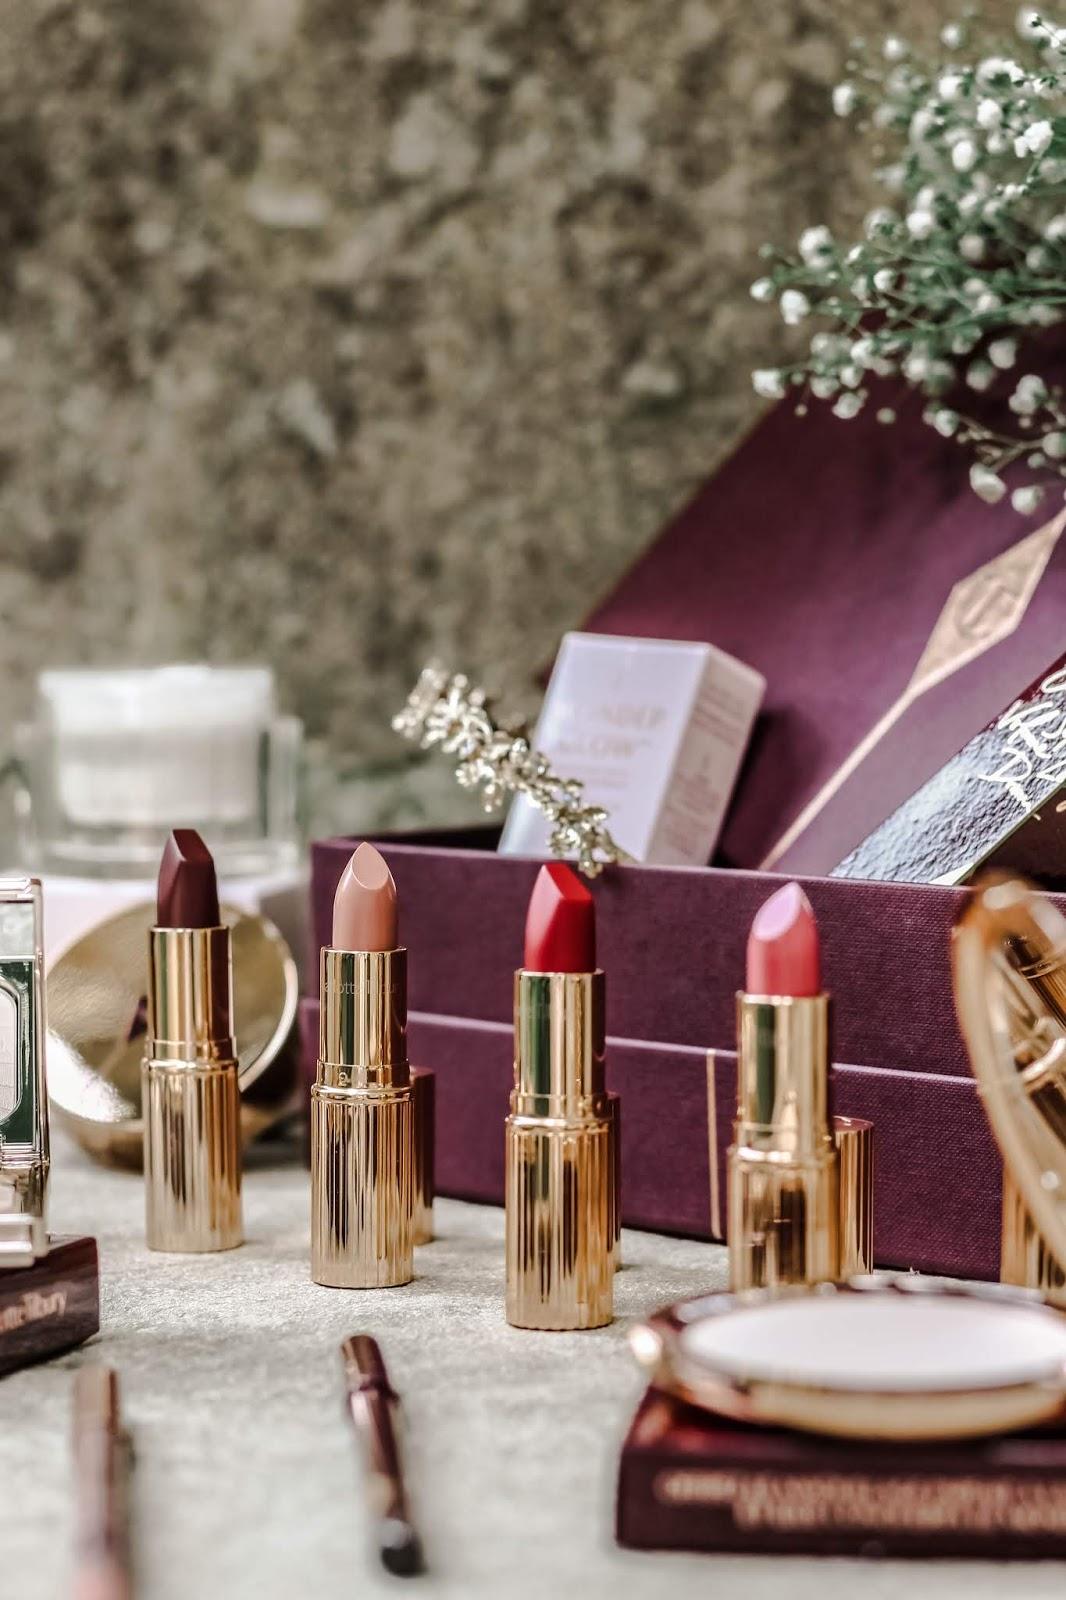 Charlotte Tilbury K.I.S.S.I.N.G. and Matte Lipsticks